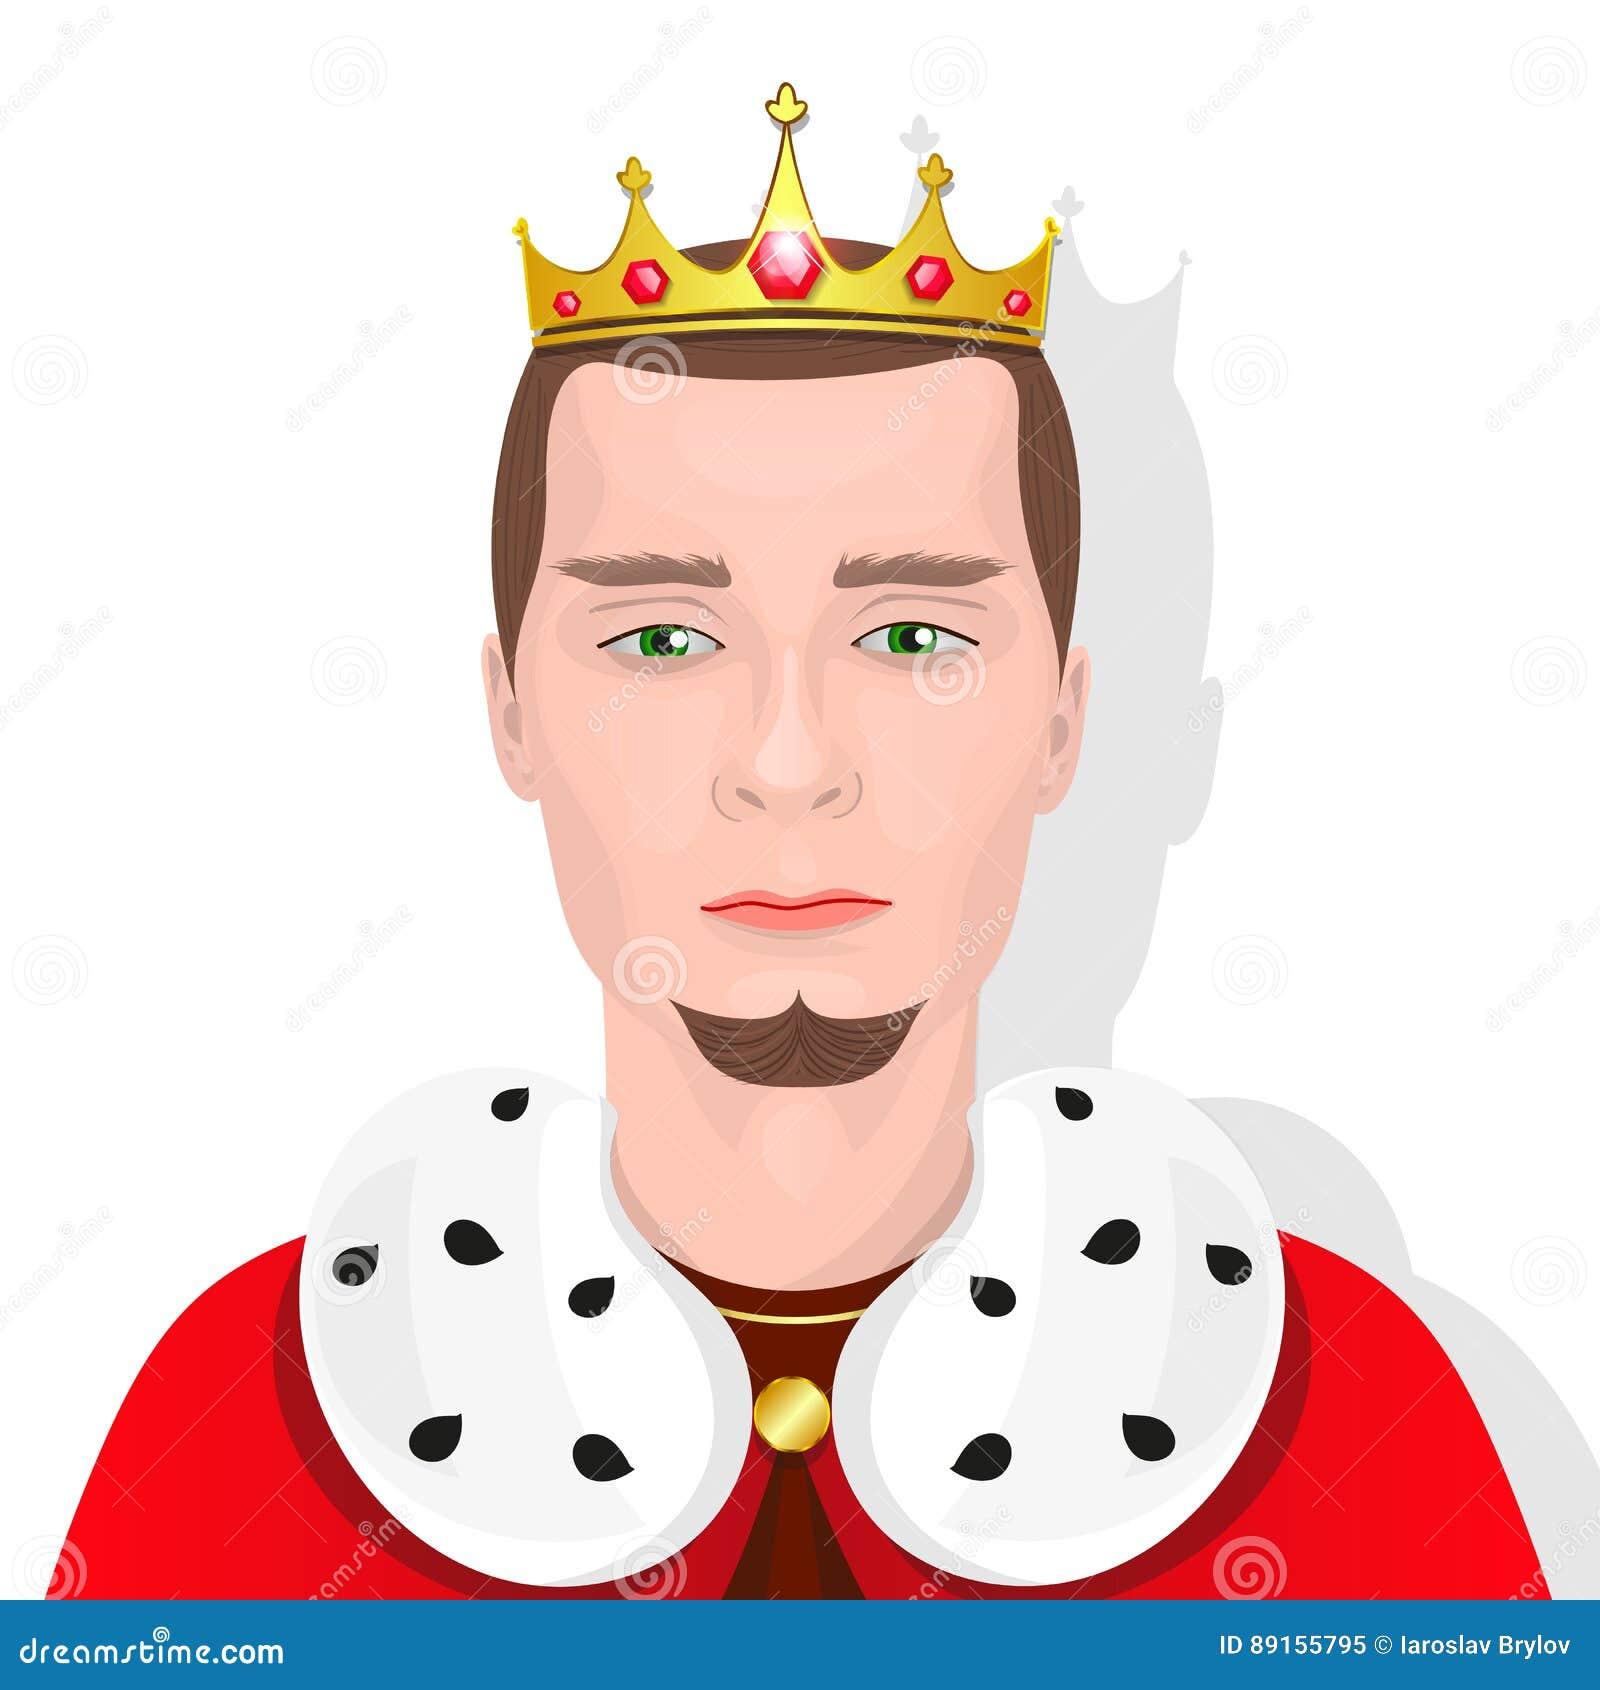 Gebaarde koning met een kroon